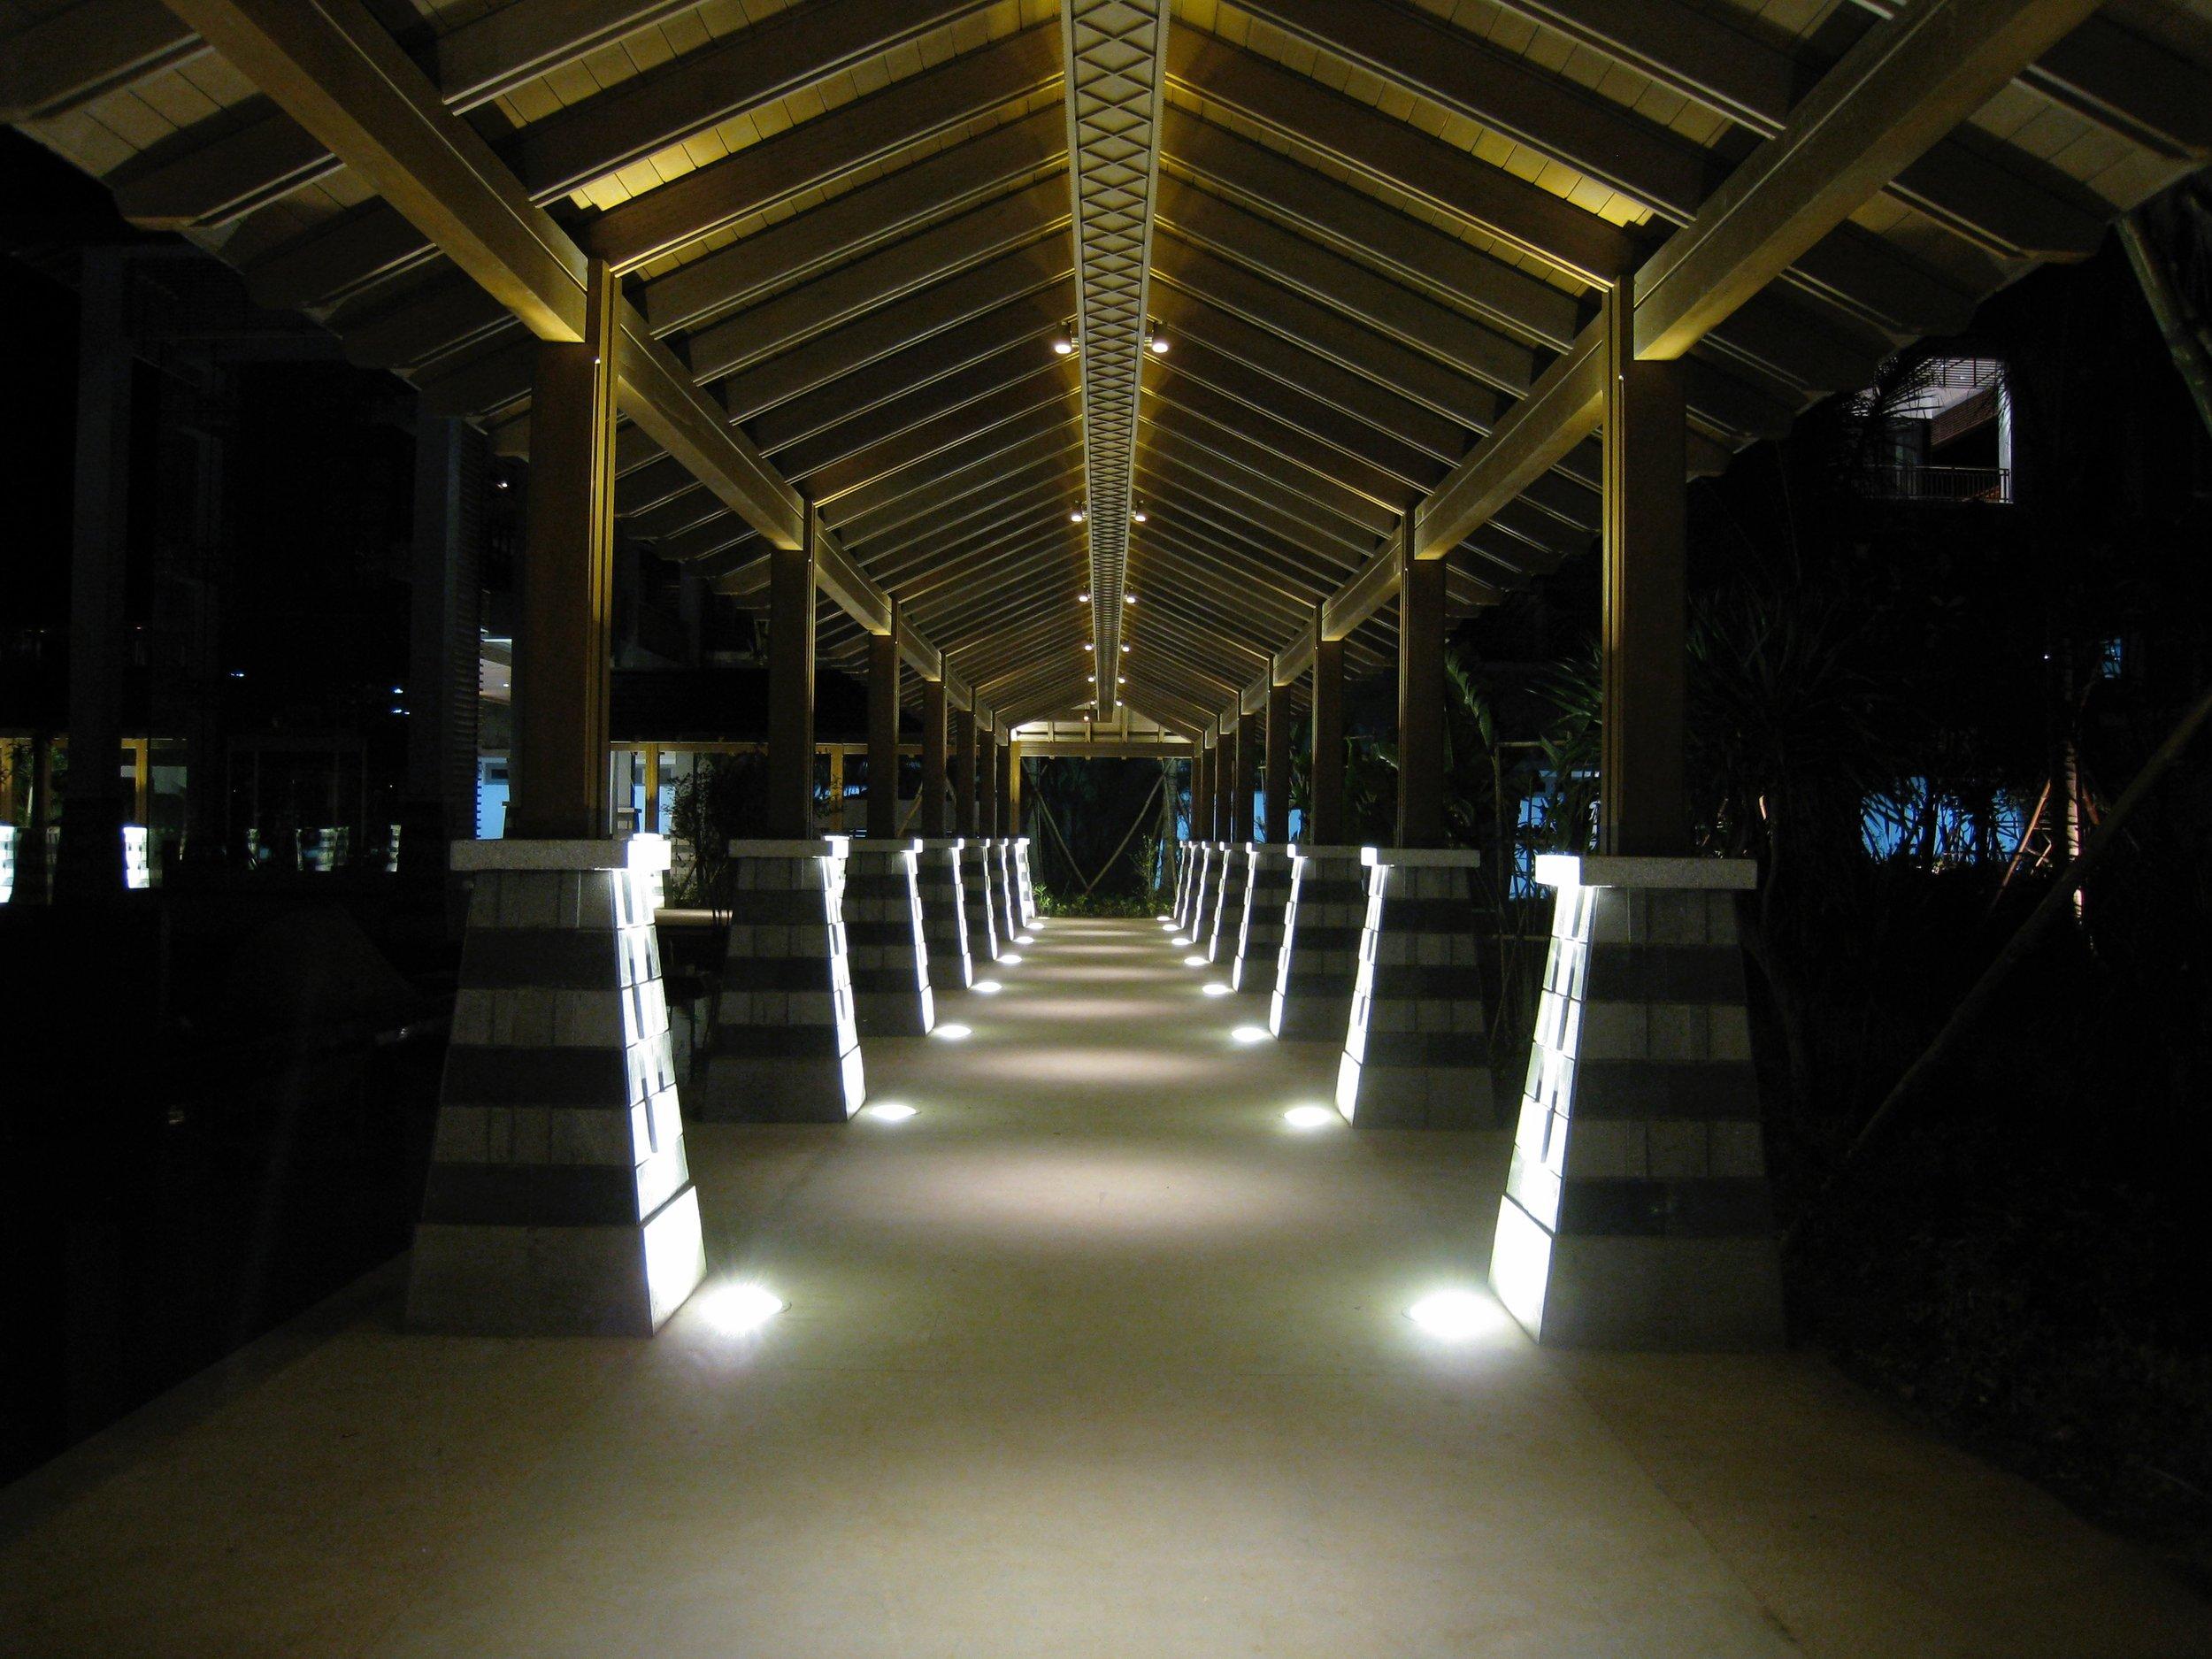 COVERED WALK WAY @ LE MERIDIEN SHIMEI BAY, HAINAN ISLAND, PRC.